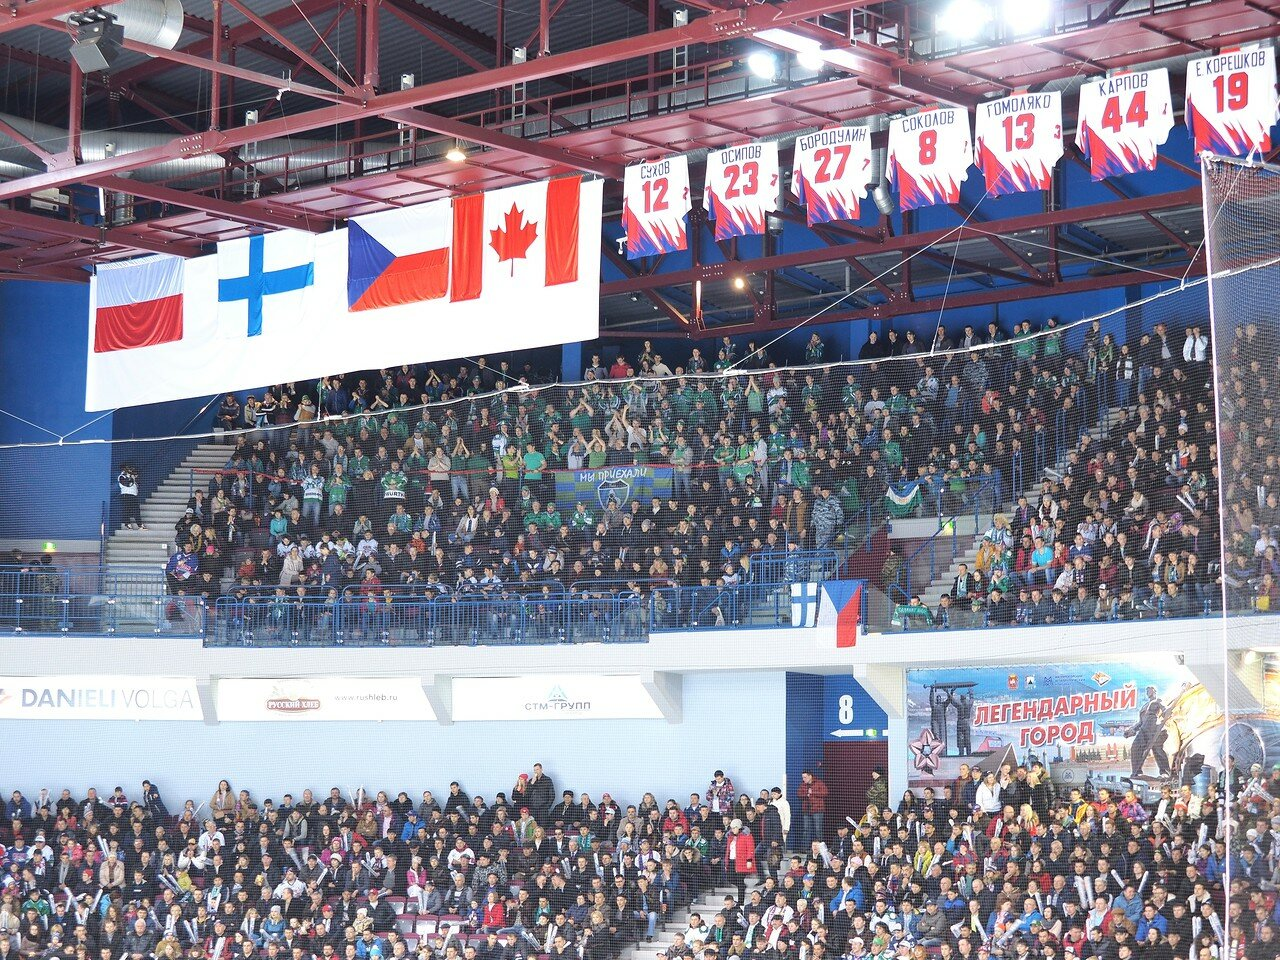 20Плей-офф 2016 Восток Финал Металлург - Салават Юлаев 25.03.2016